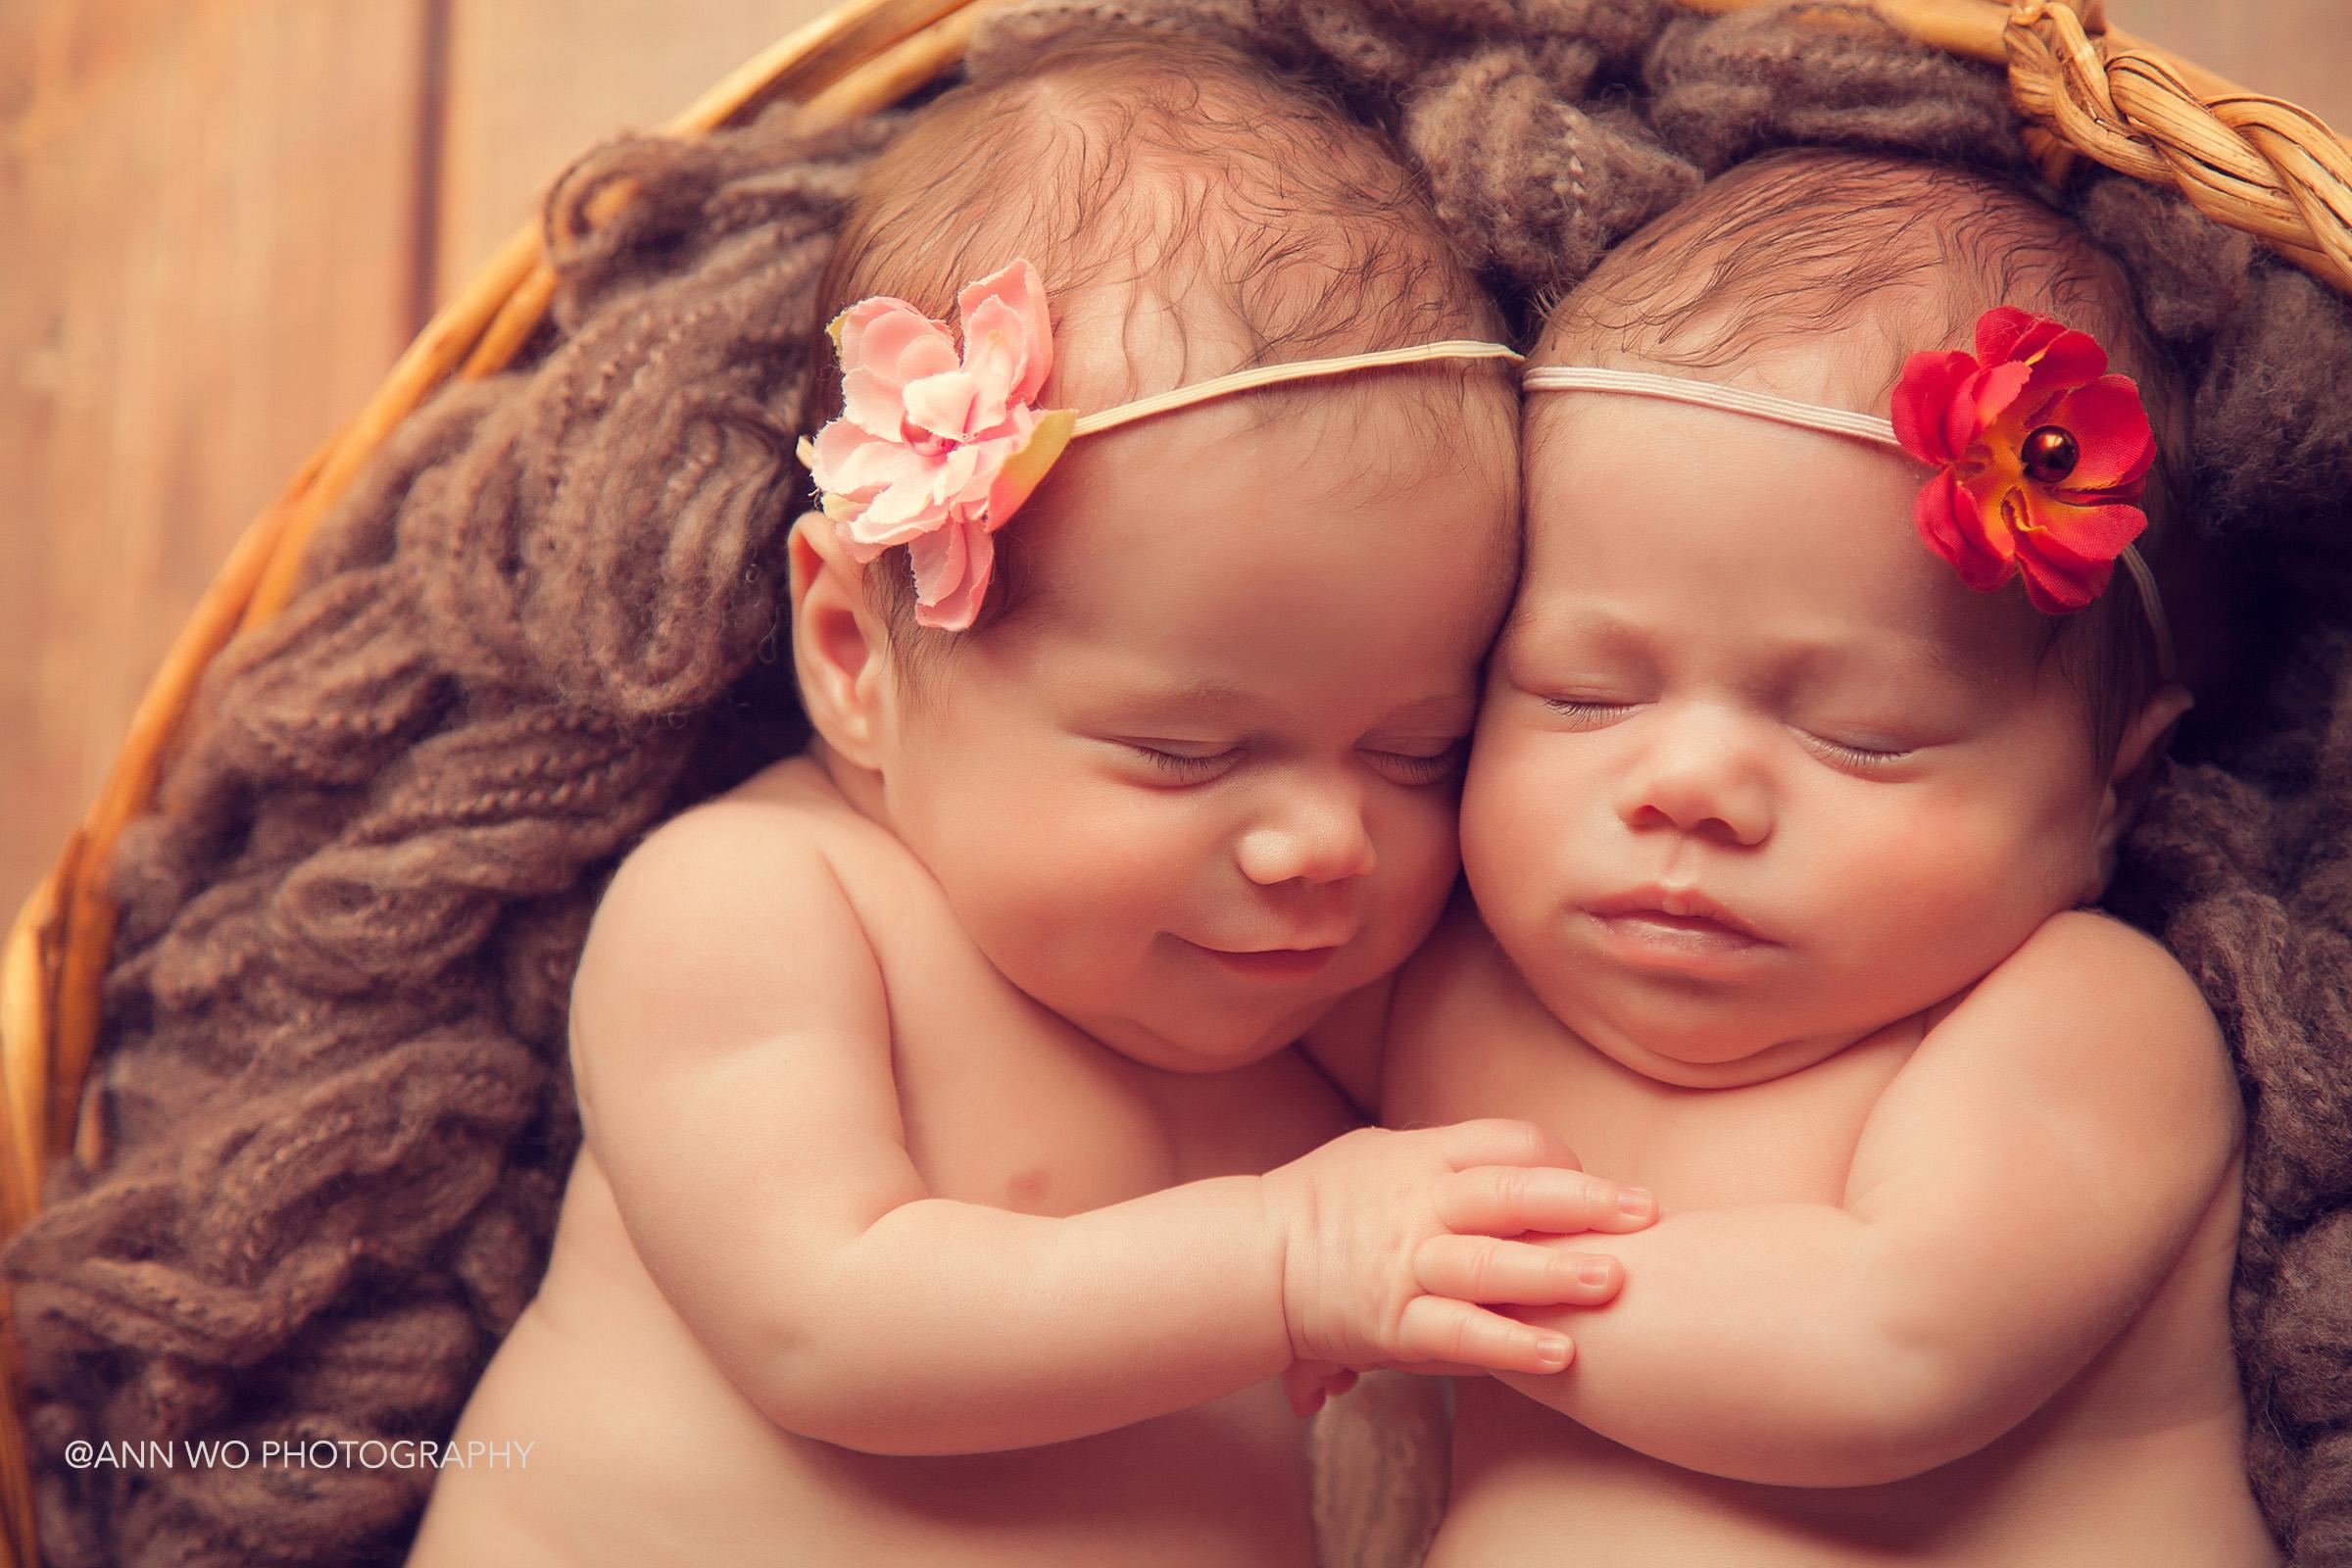 smiling newborn twins hugging - ann wo photography in London